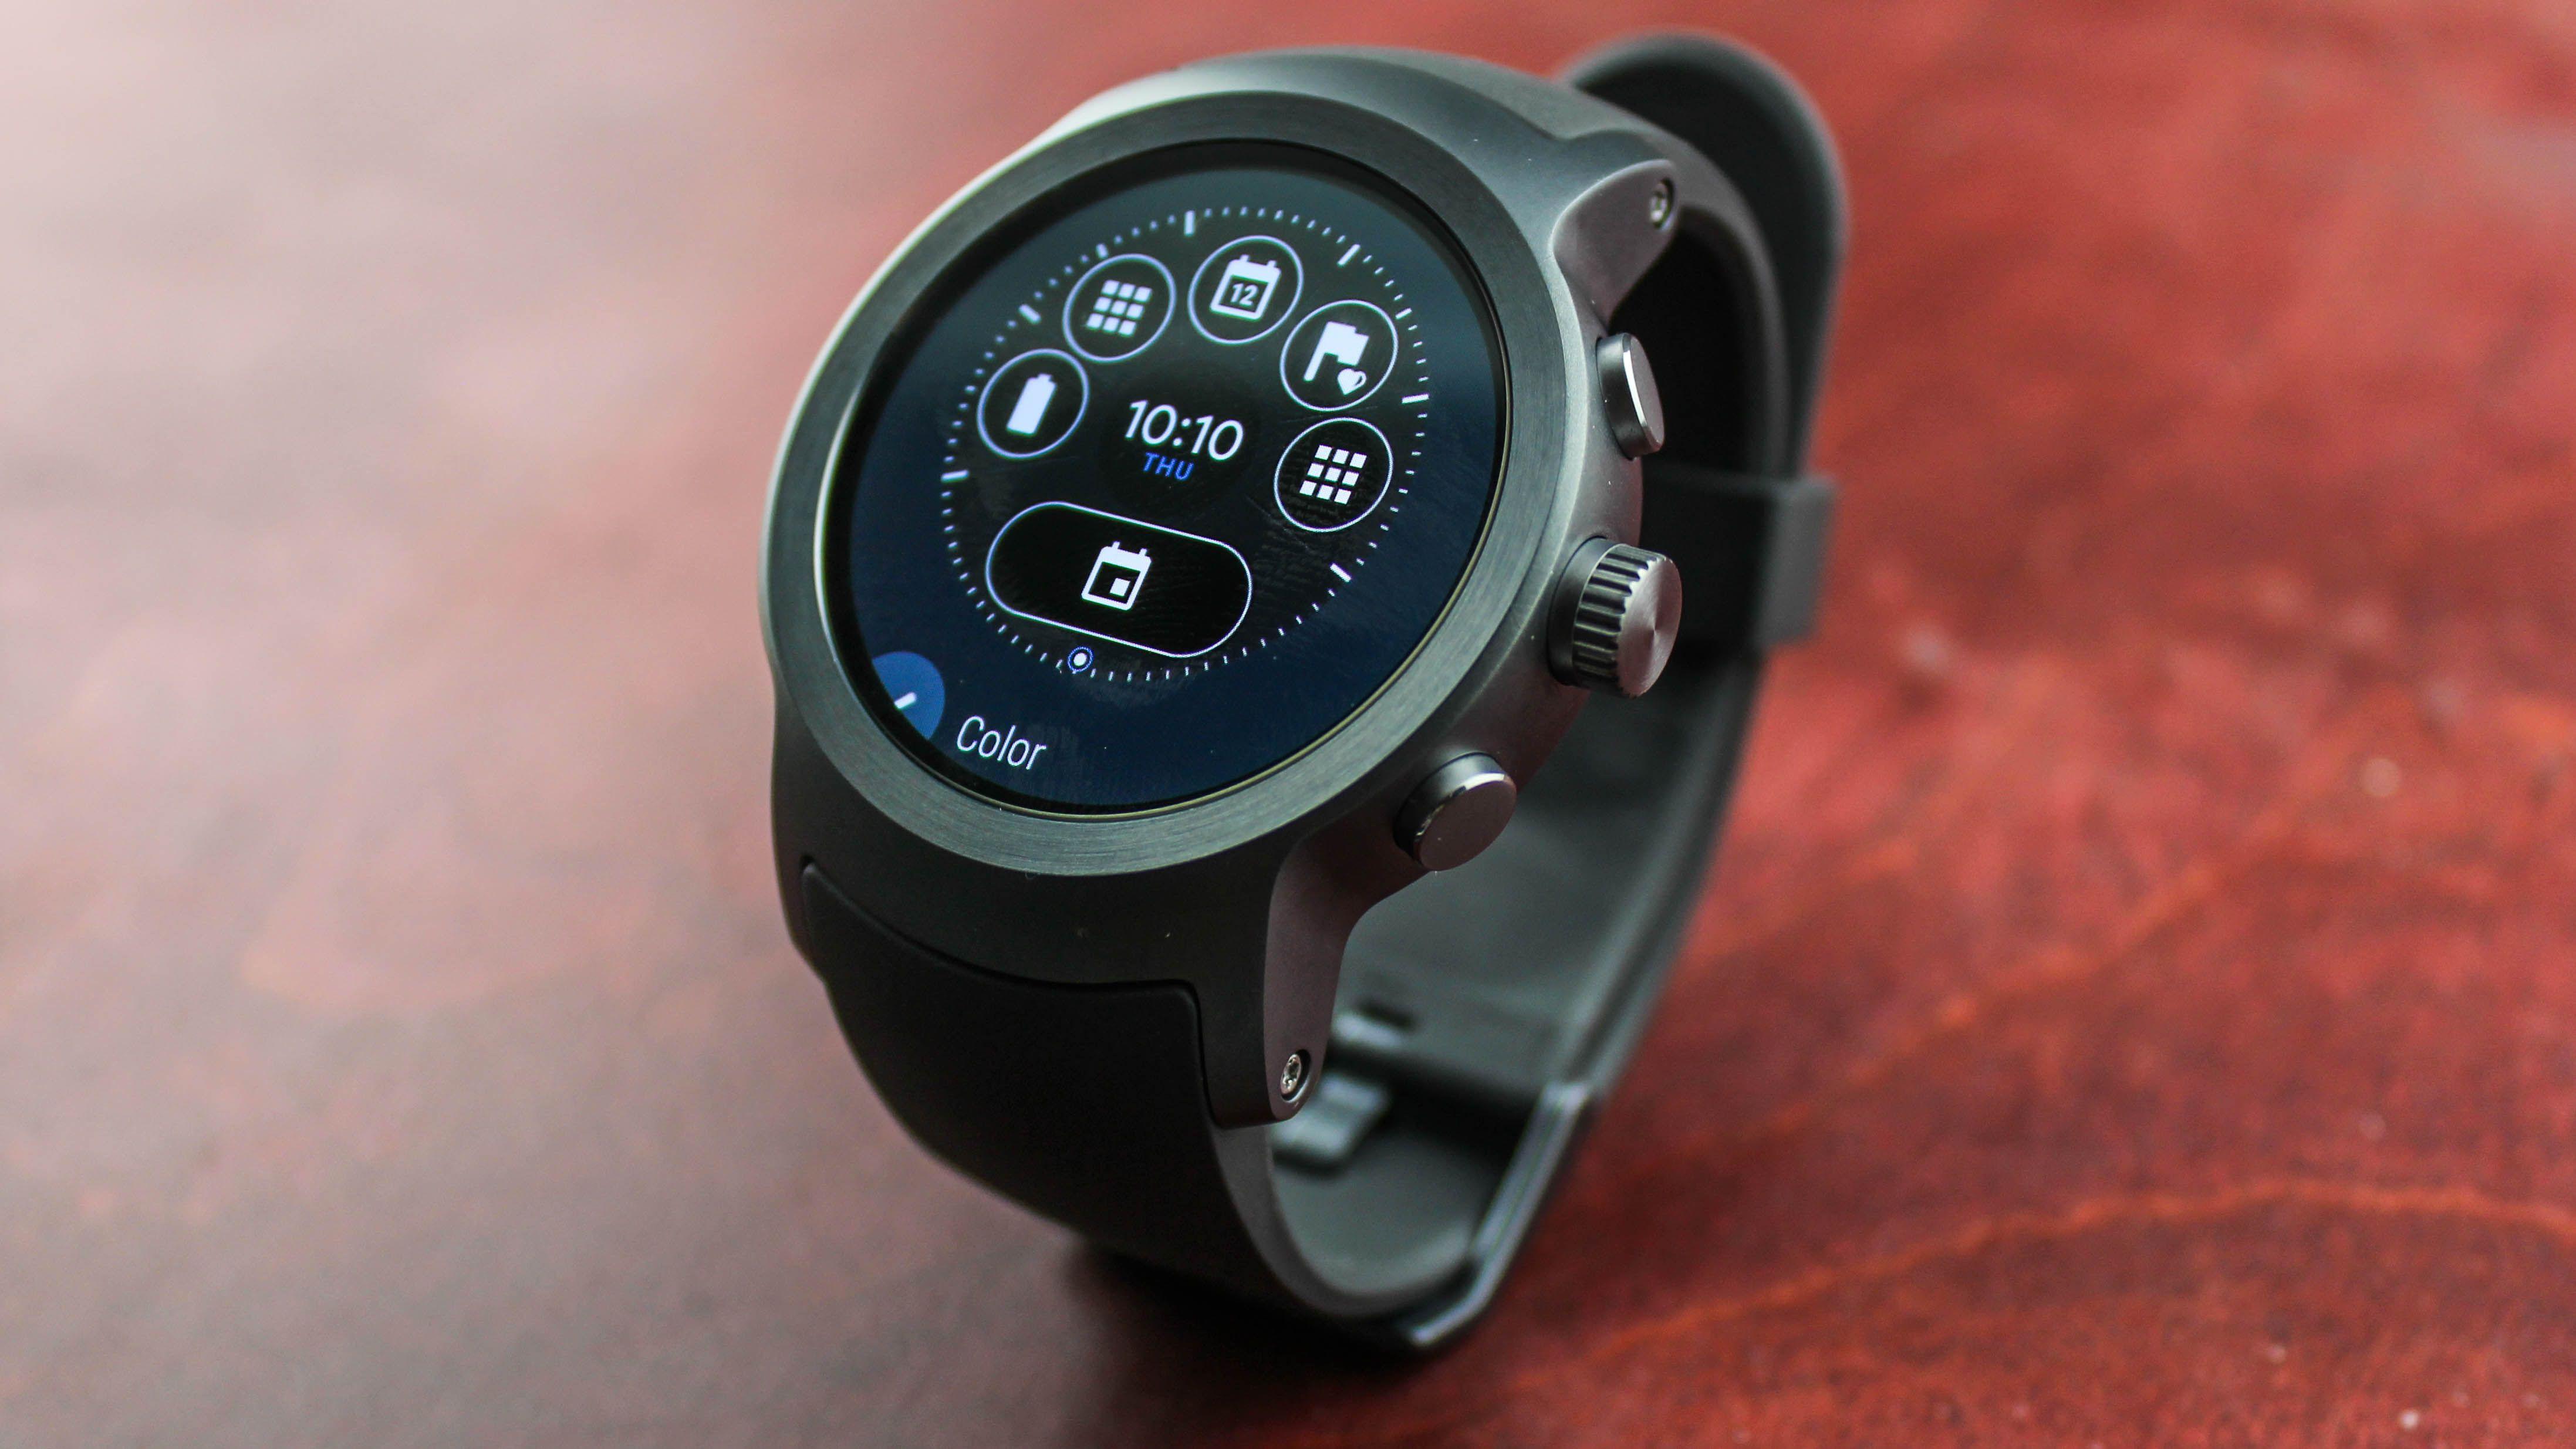 images?q=tbn:ANd9GcQh_l3eQ5xwiPy07kGEXjmjgmBKBRB7H2mRxCGhv1tFWg5c_mWT Smartwatch Os